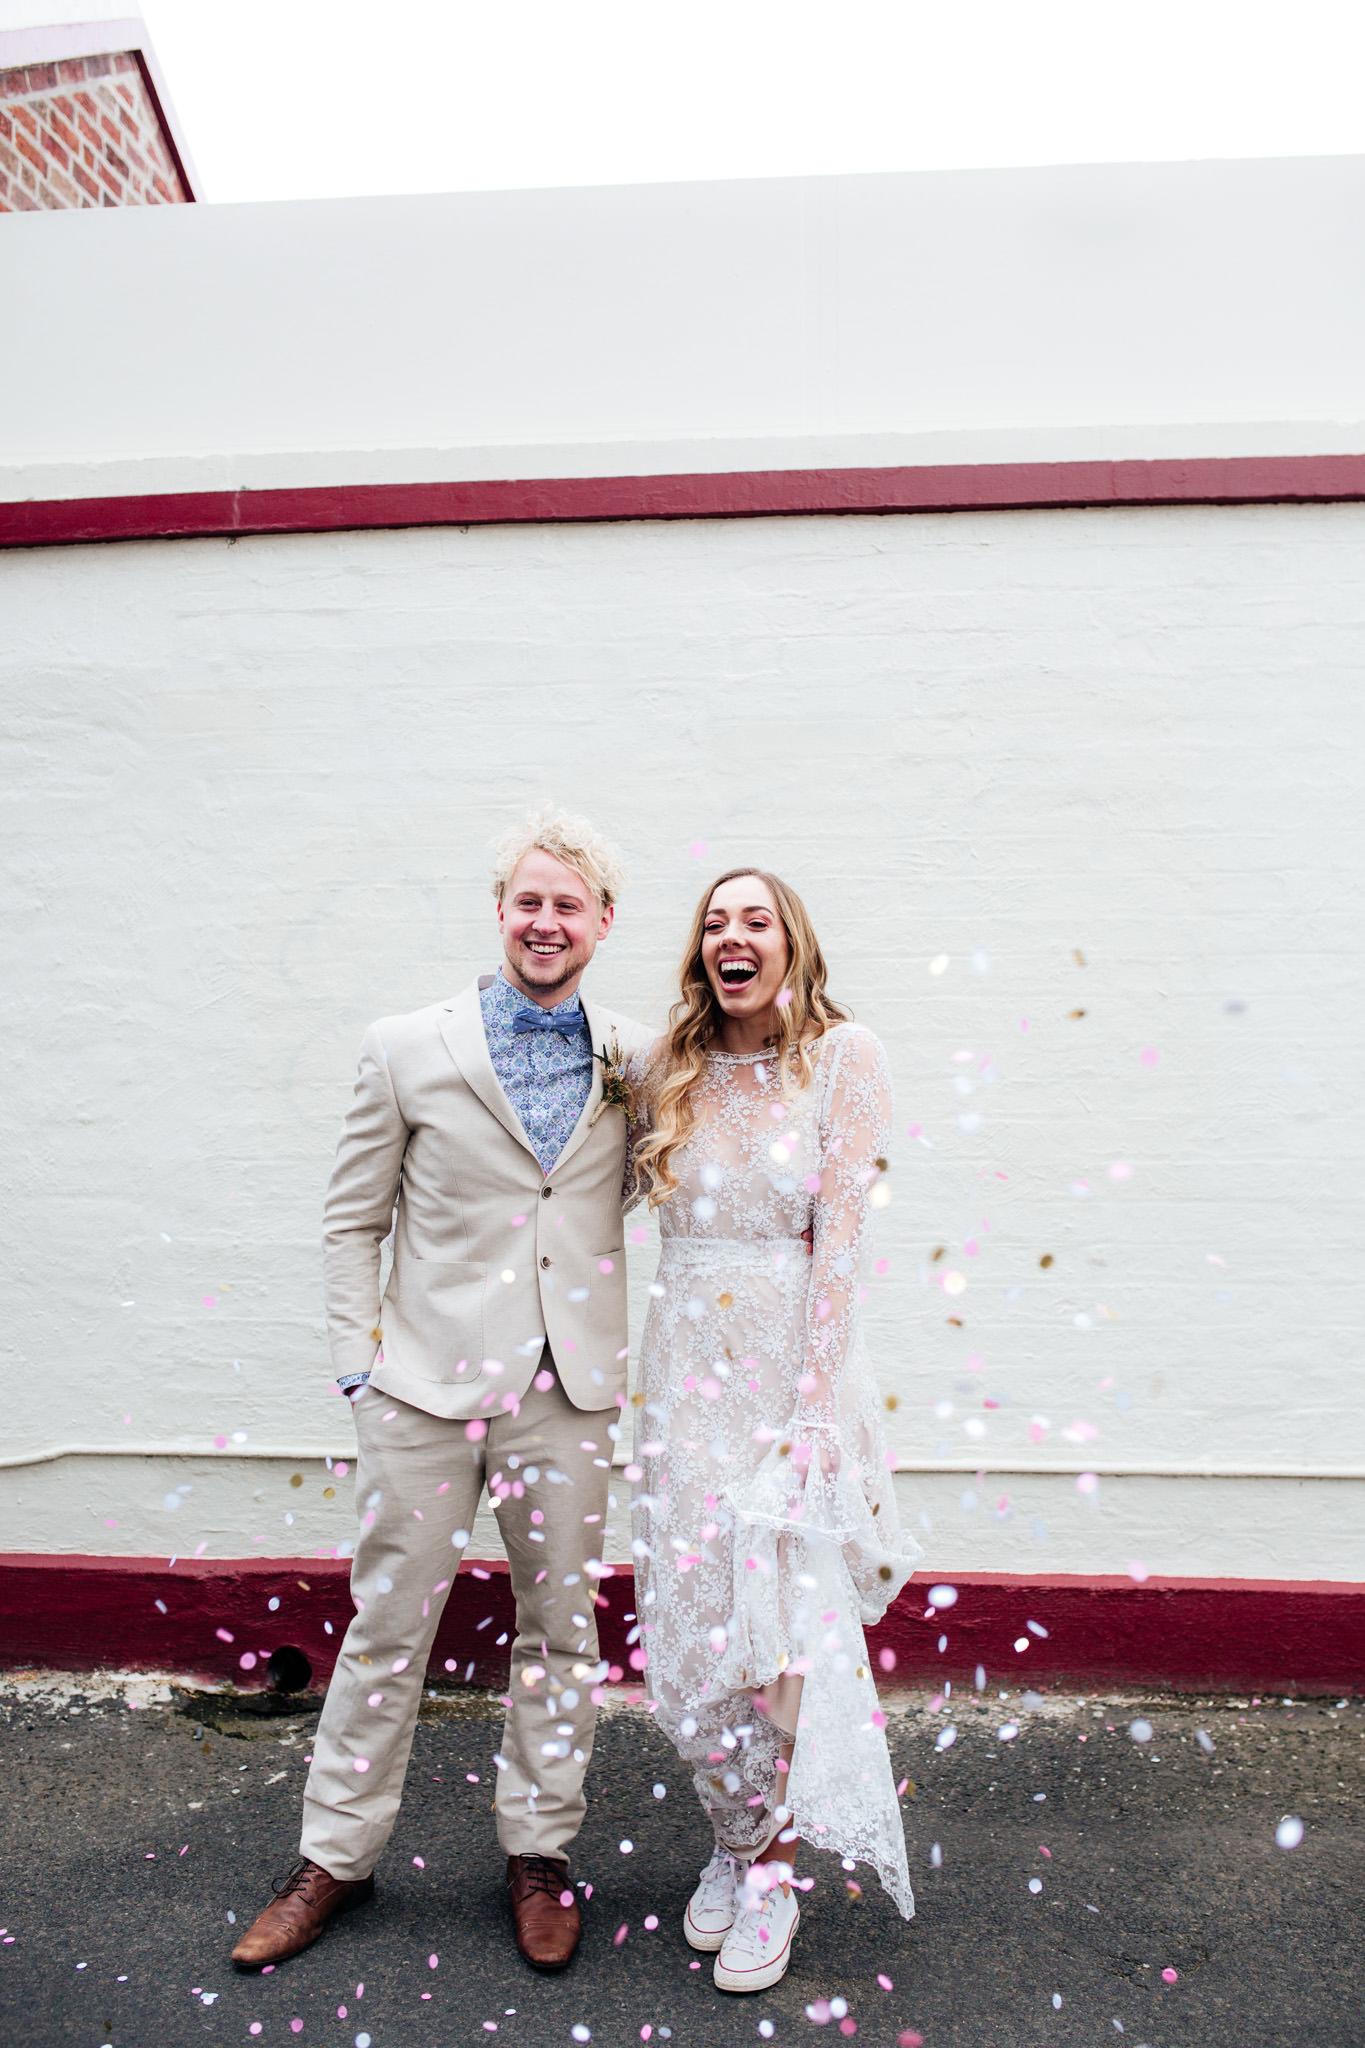 Aster and Rose - Wedding Planner and Co-ordinator - Torquay, Geelong, Surfcoast - Summer Wedding-190.jpg